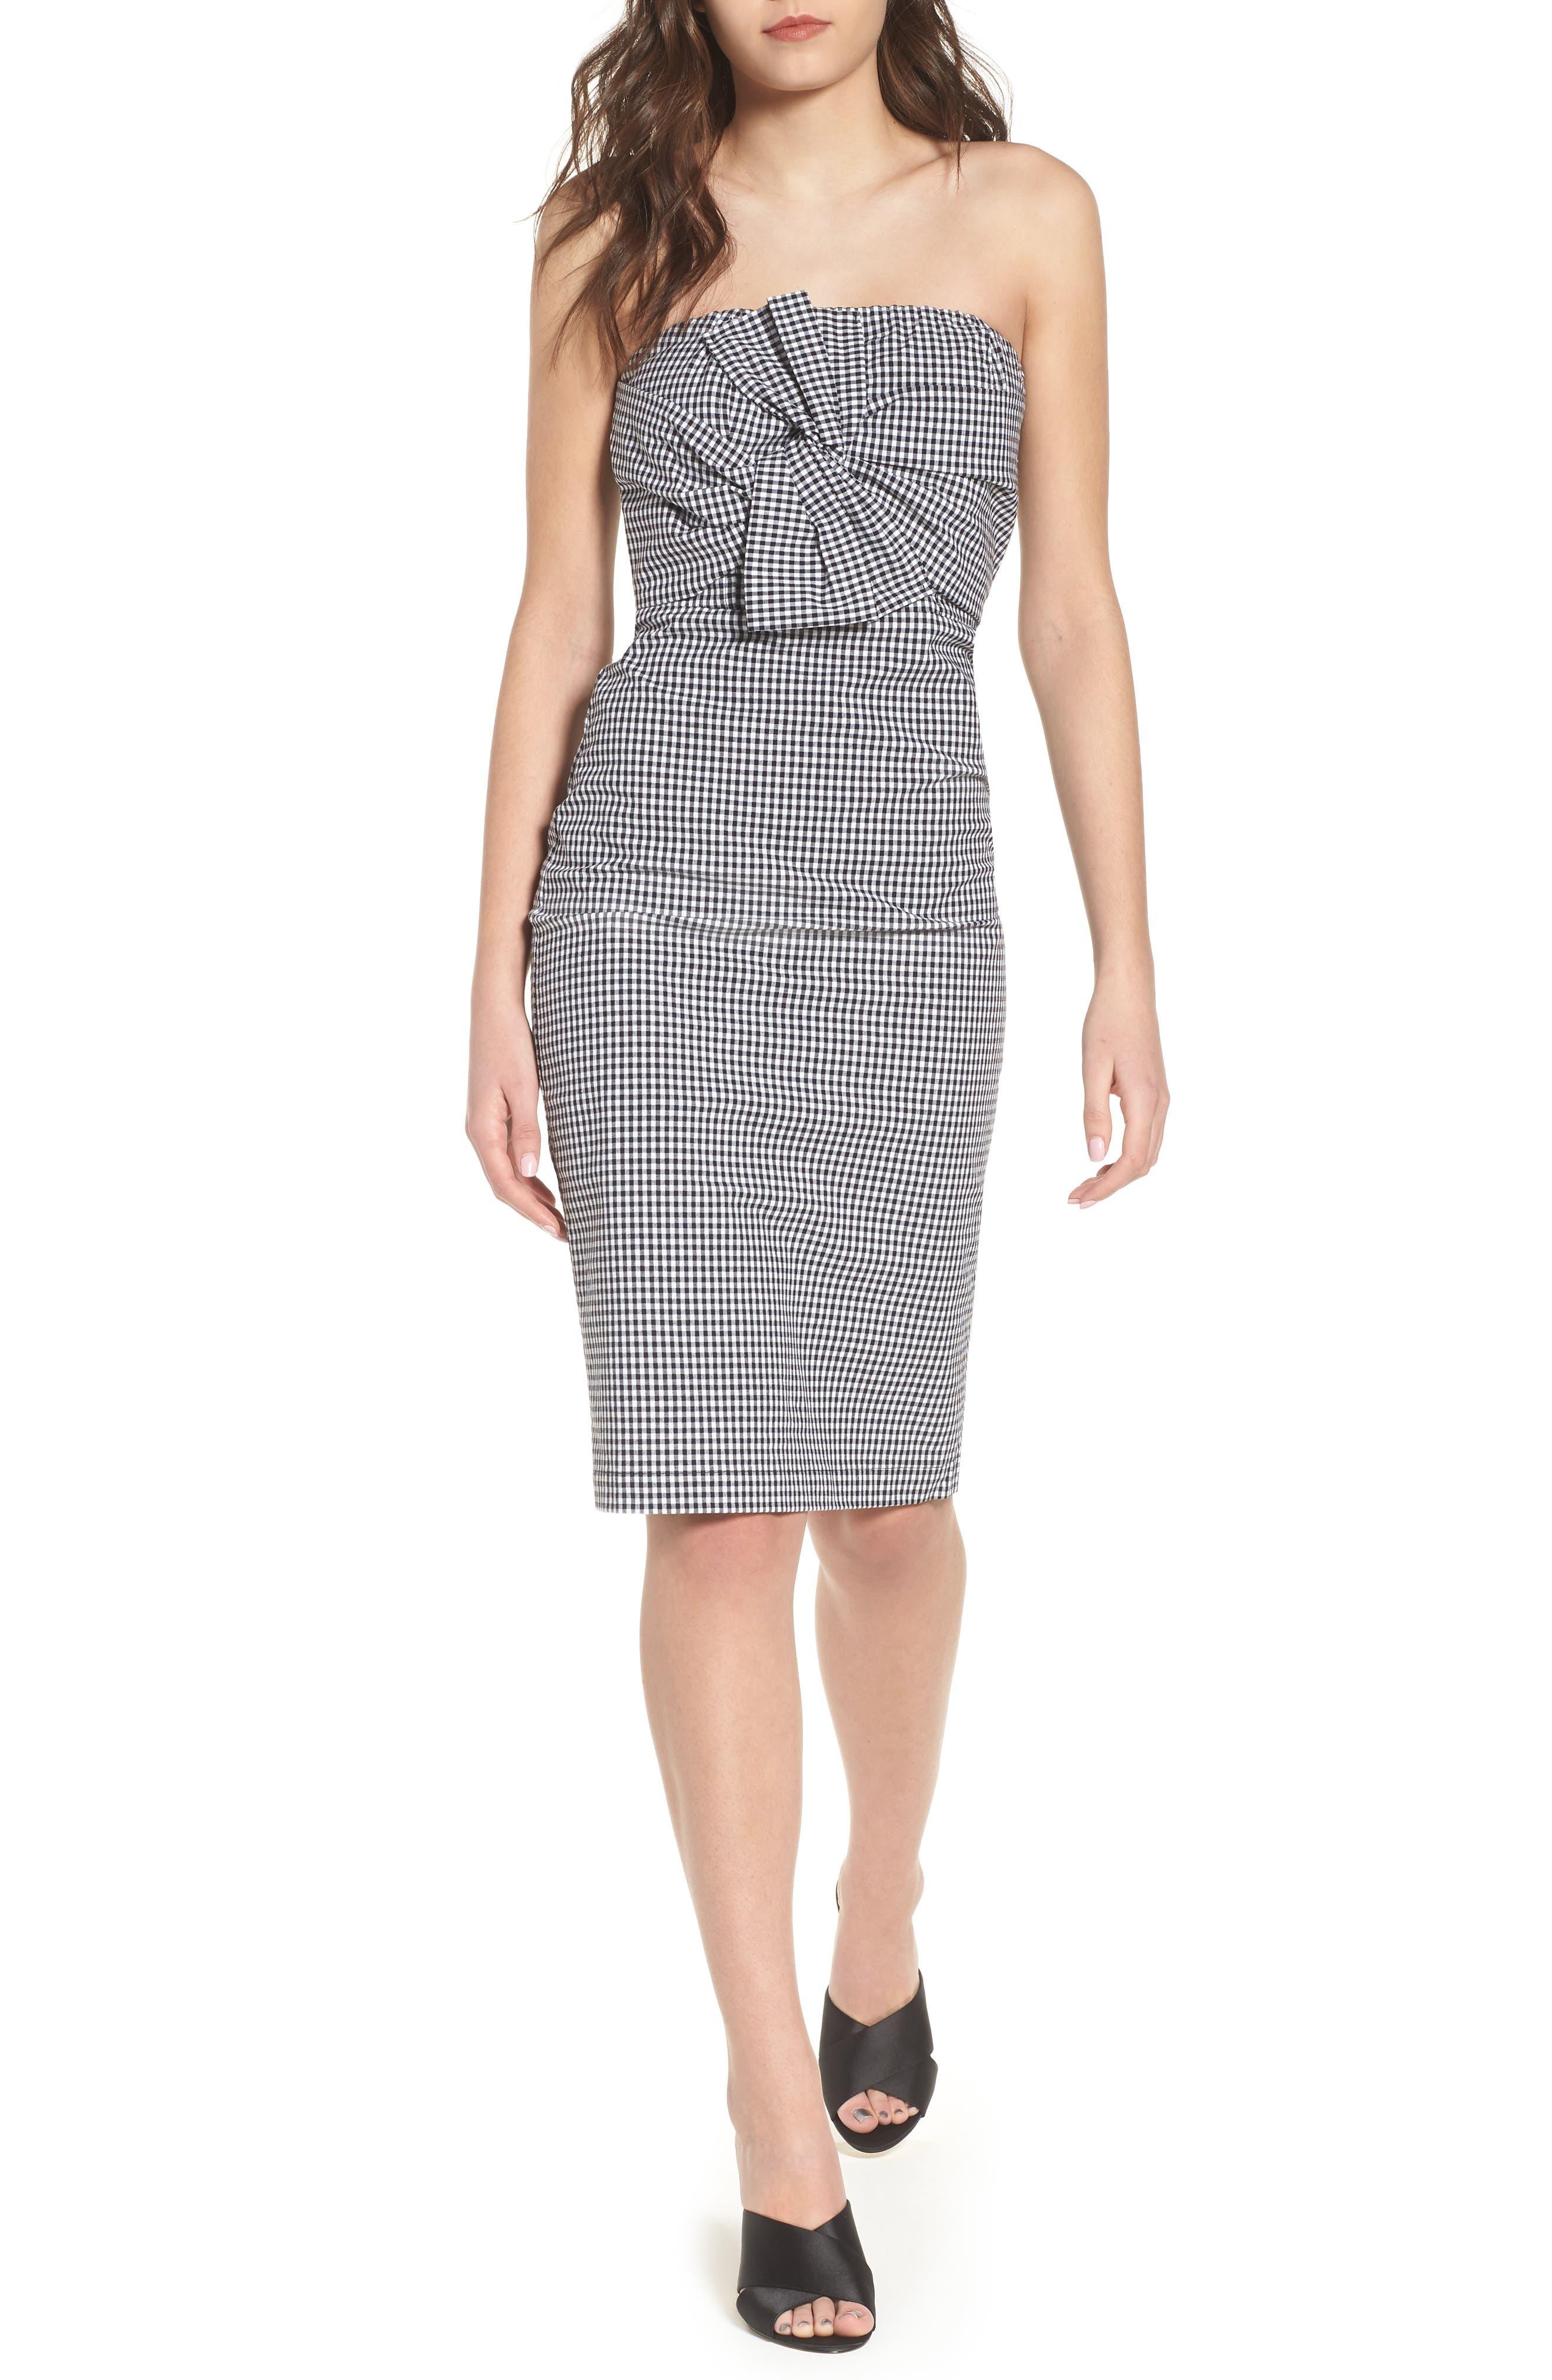 Strapless Gingham Dress,                         Main,                         color, Black Gingham Stripe